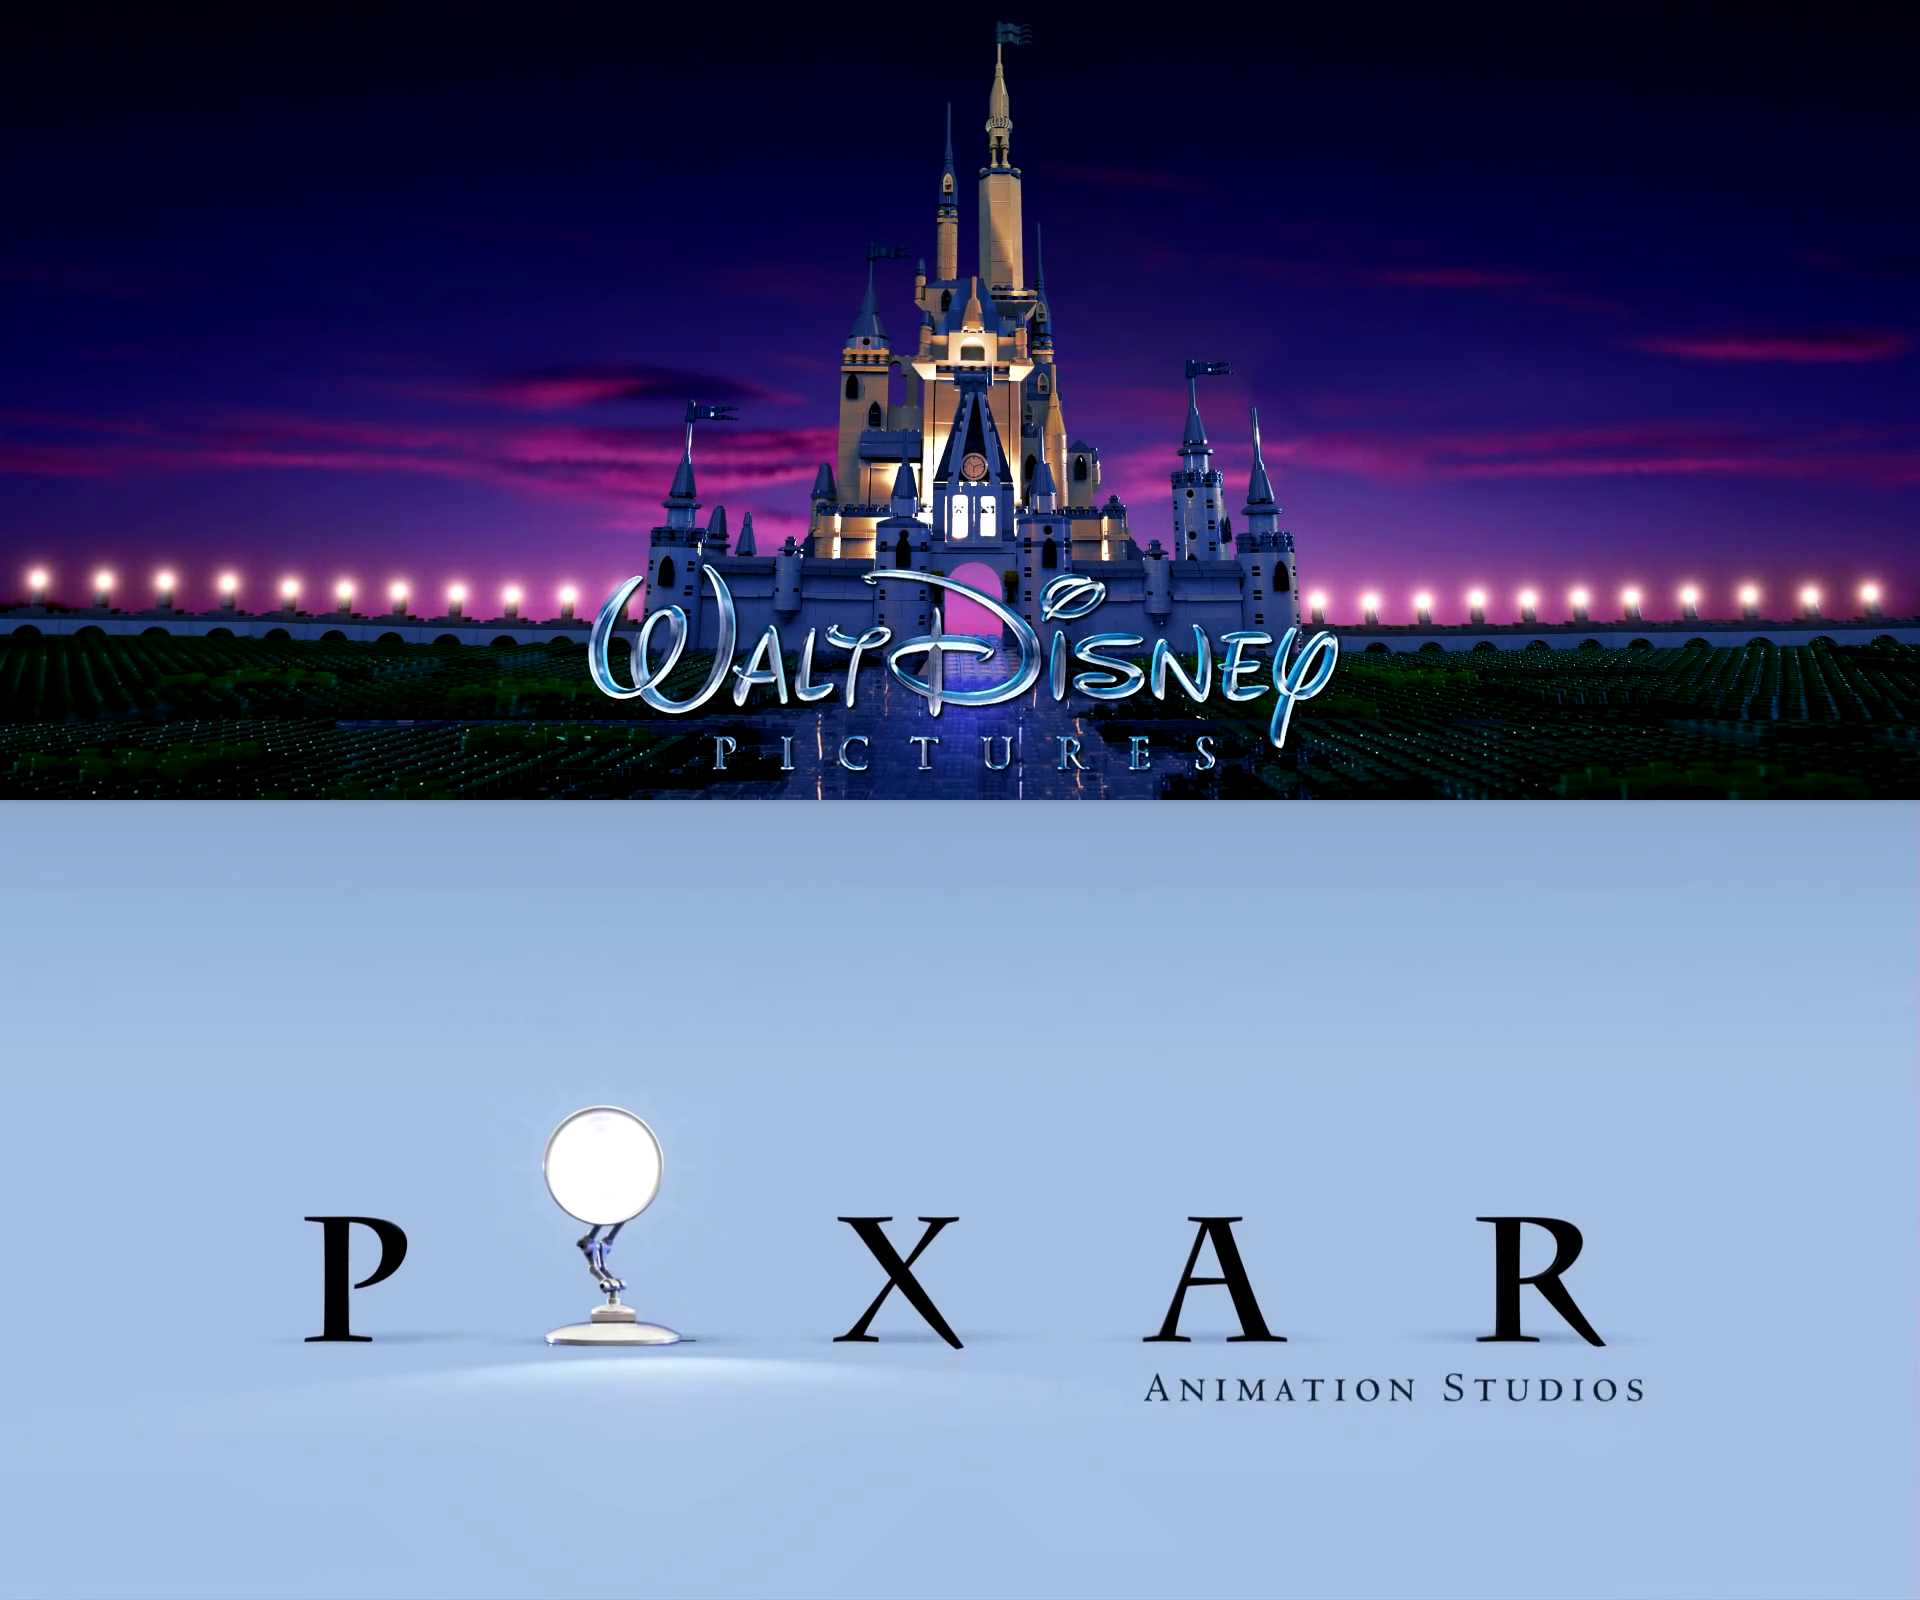 Walt Disney Pictures Pixar Animation Studios By Esteveztheart On Deviantart